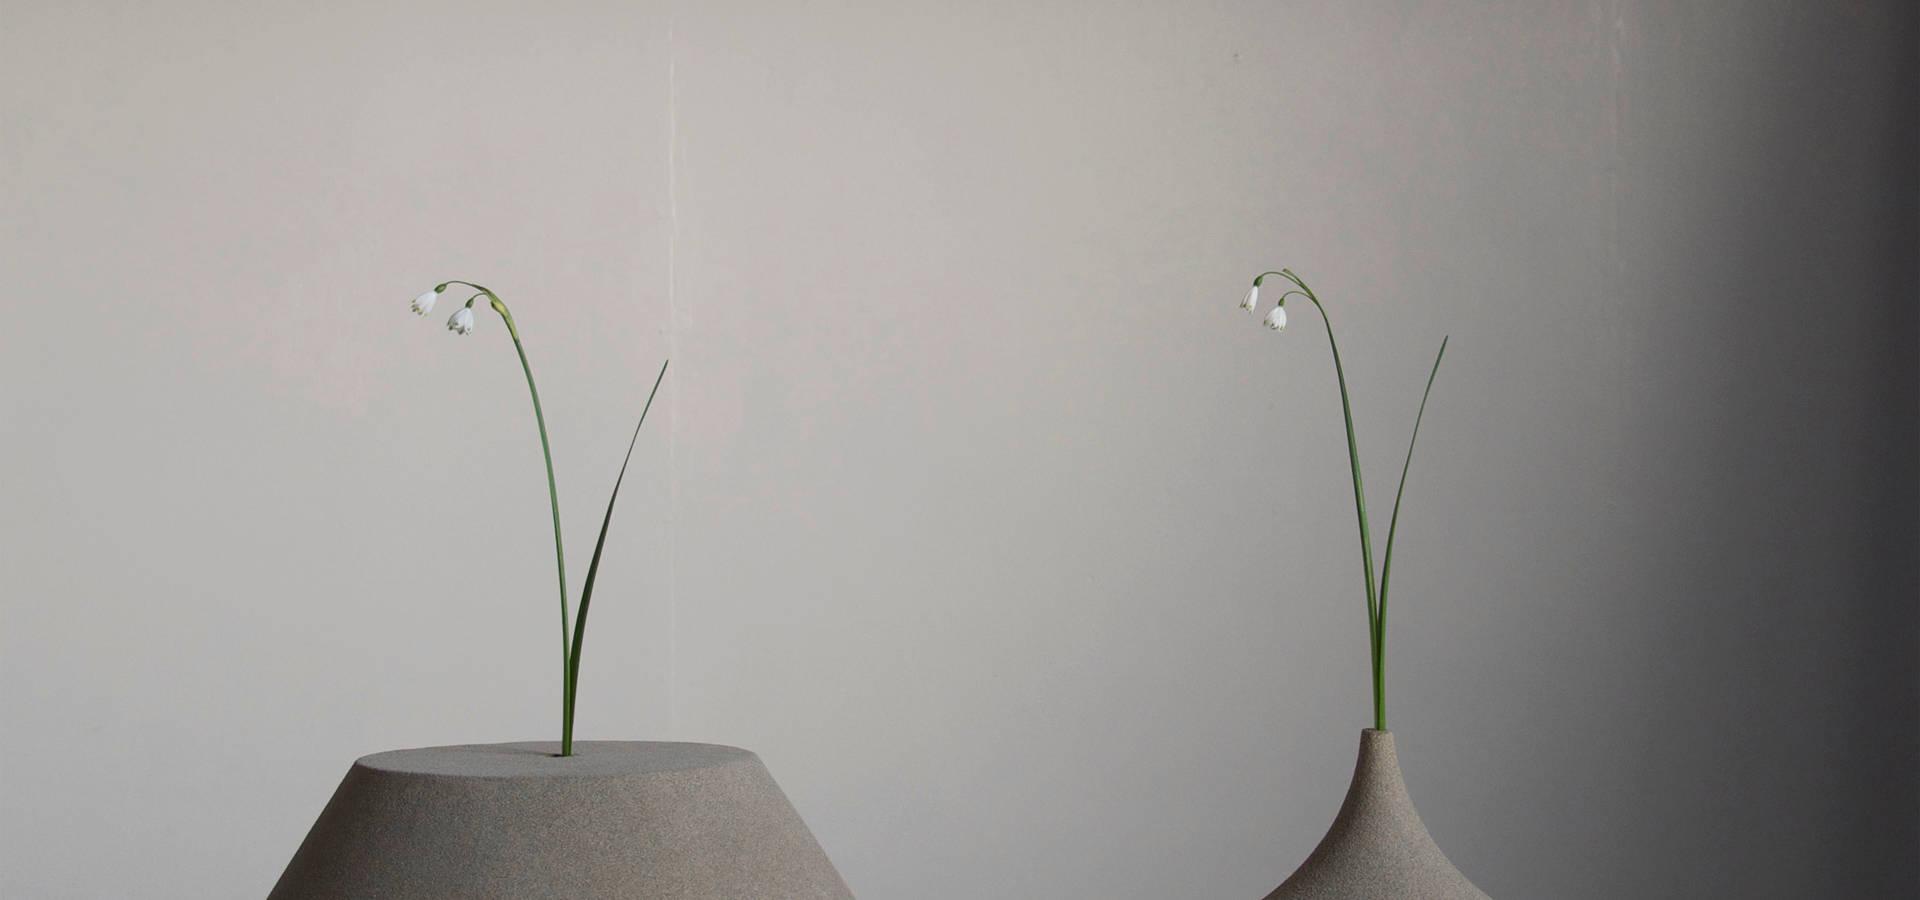 Studio Yukihiro Kaneuchi